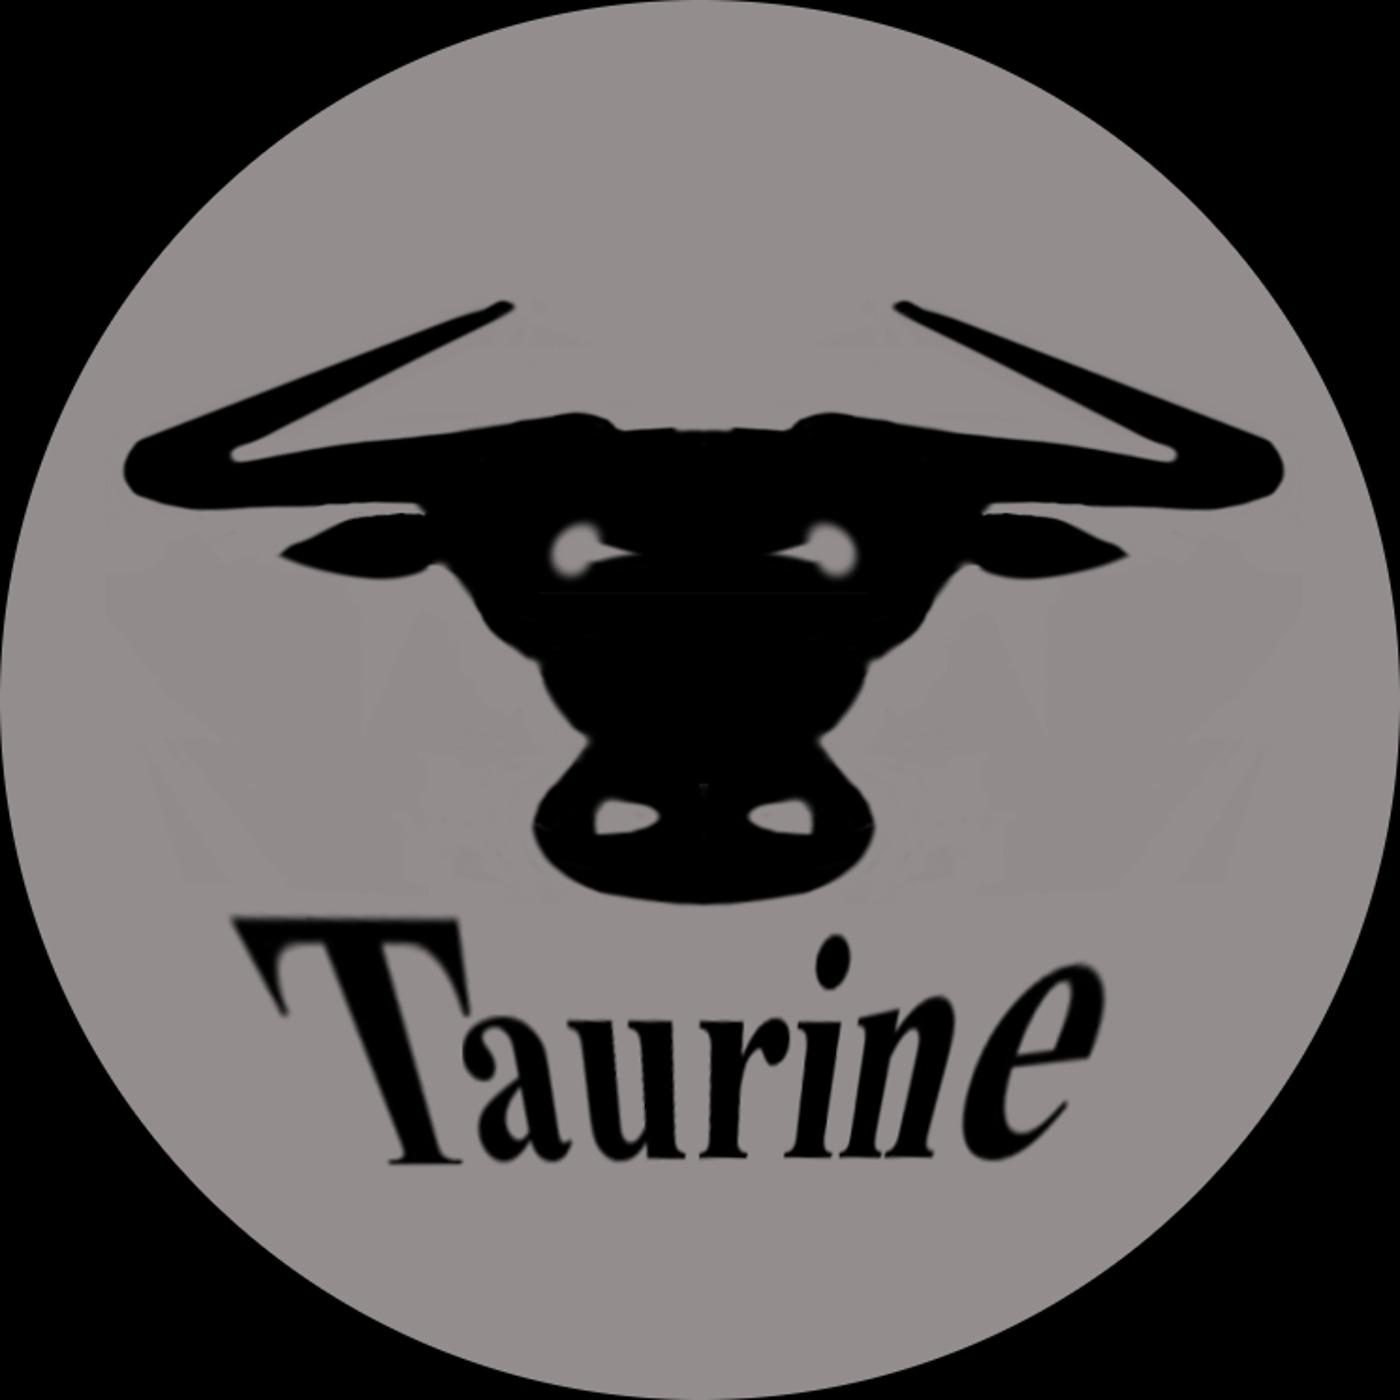 Frank Taurus Podcast